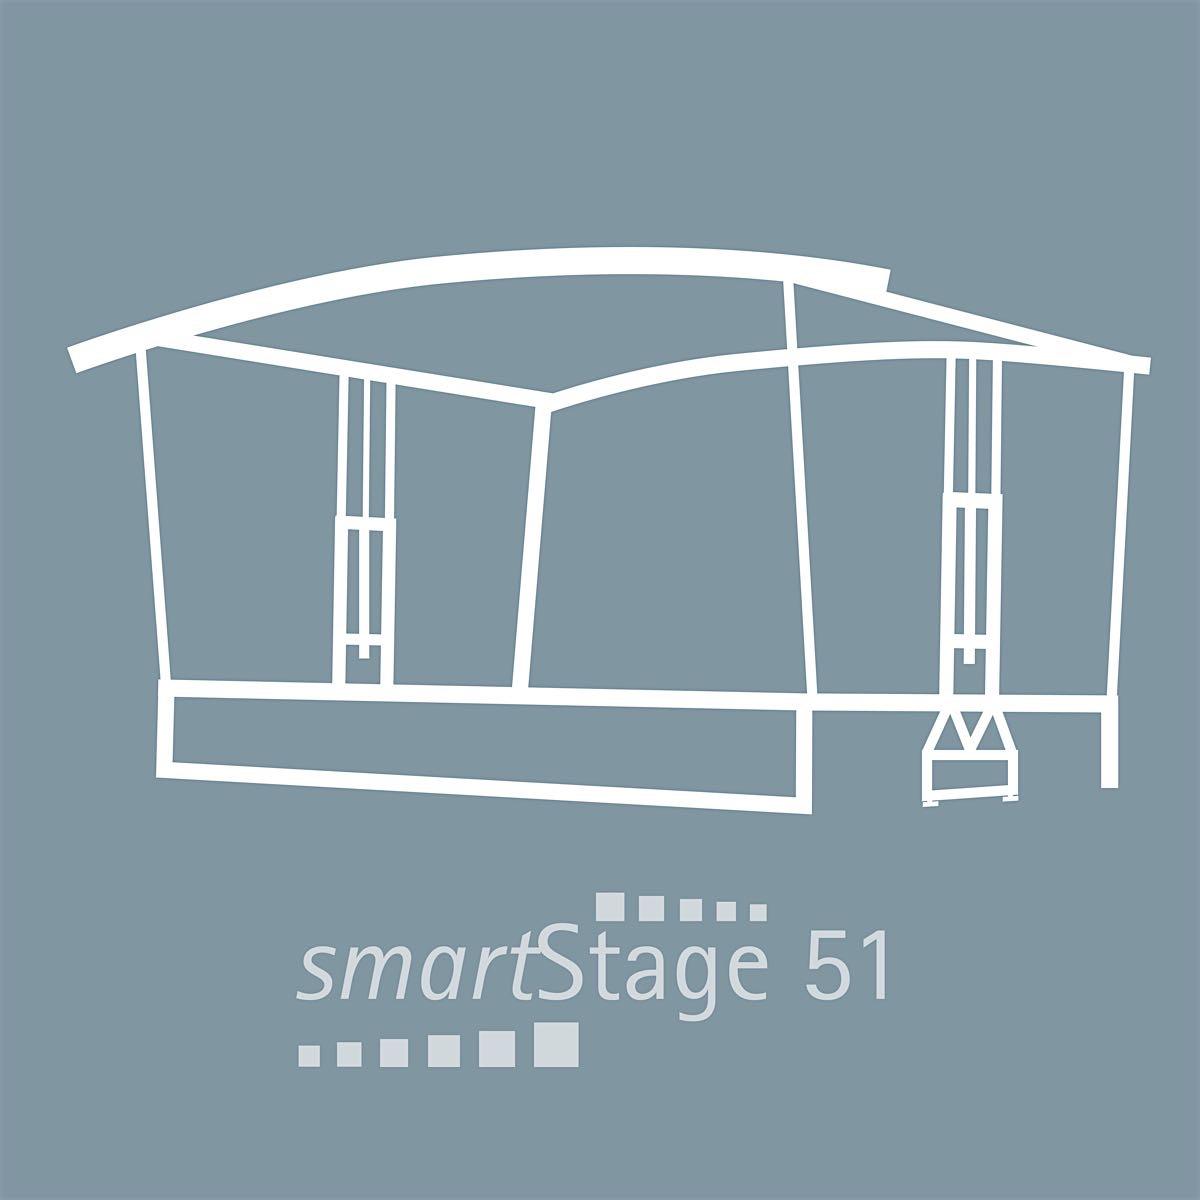 smartStage 51 - 49 qm área8.00 m ancho6.20 m profundidad4.95 m altura [5.30m]